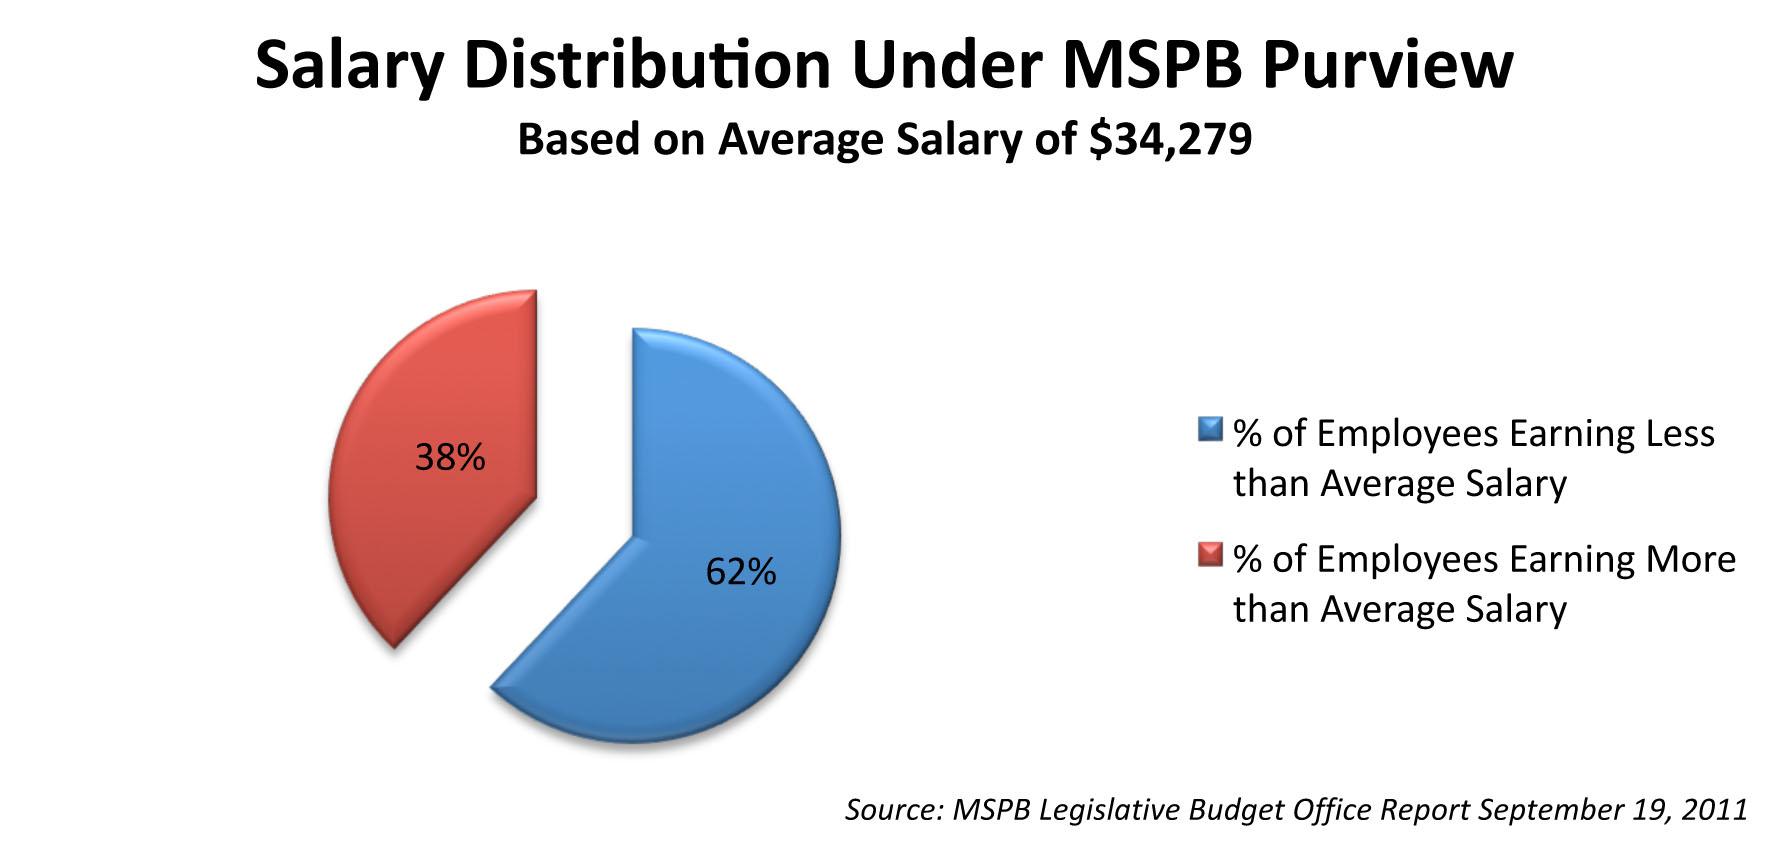 Microsoft Word - MSPB Budget Hearing Blog Post (Revised).docx